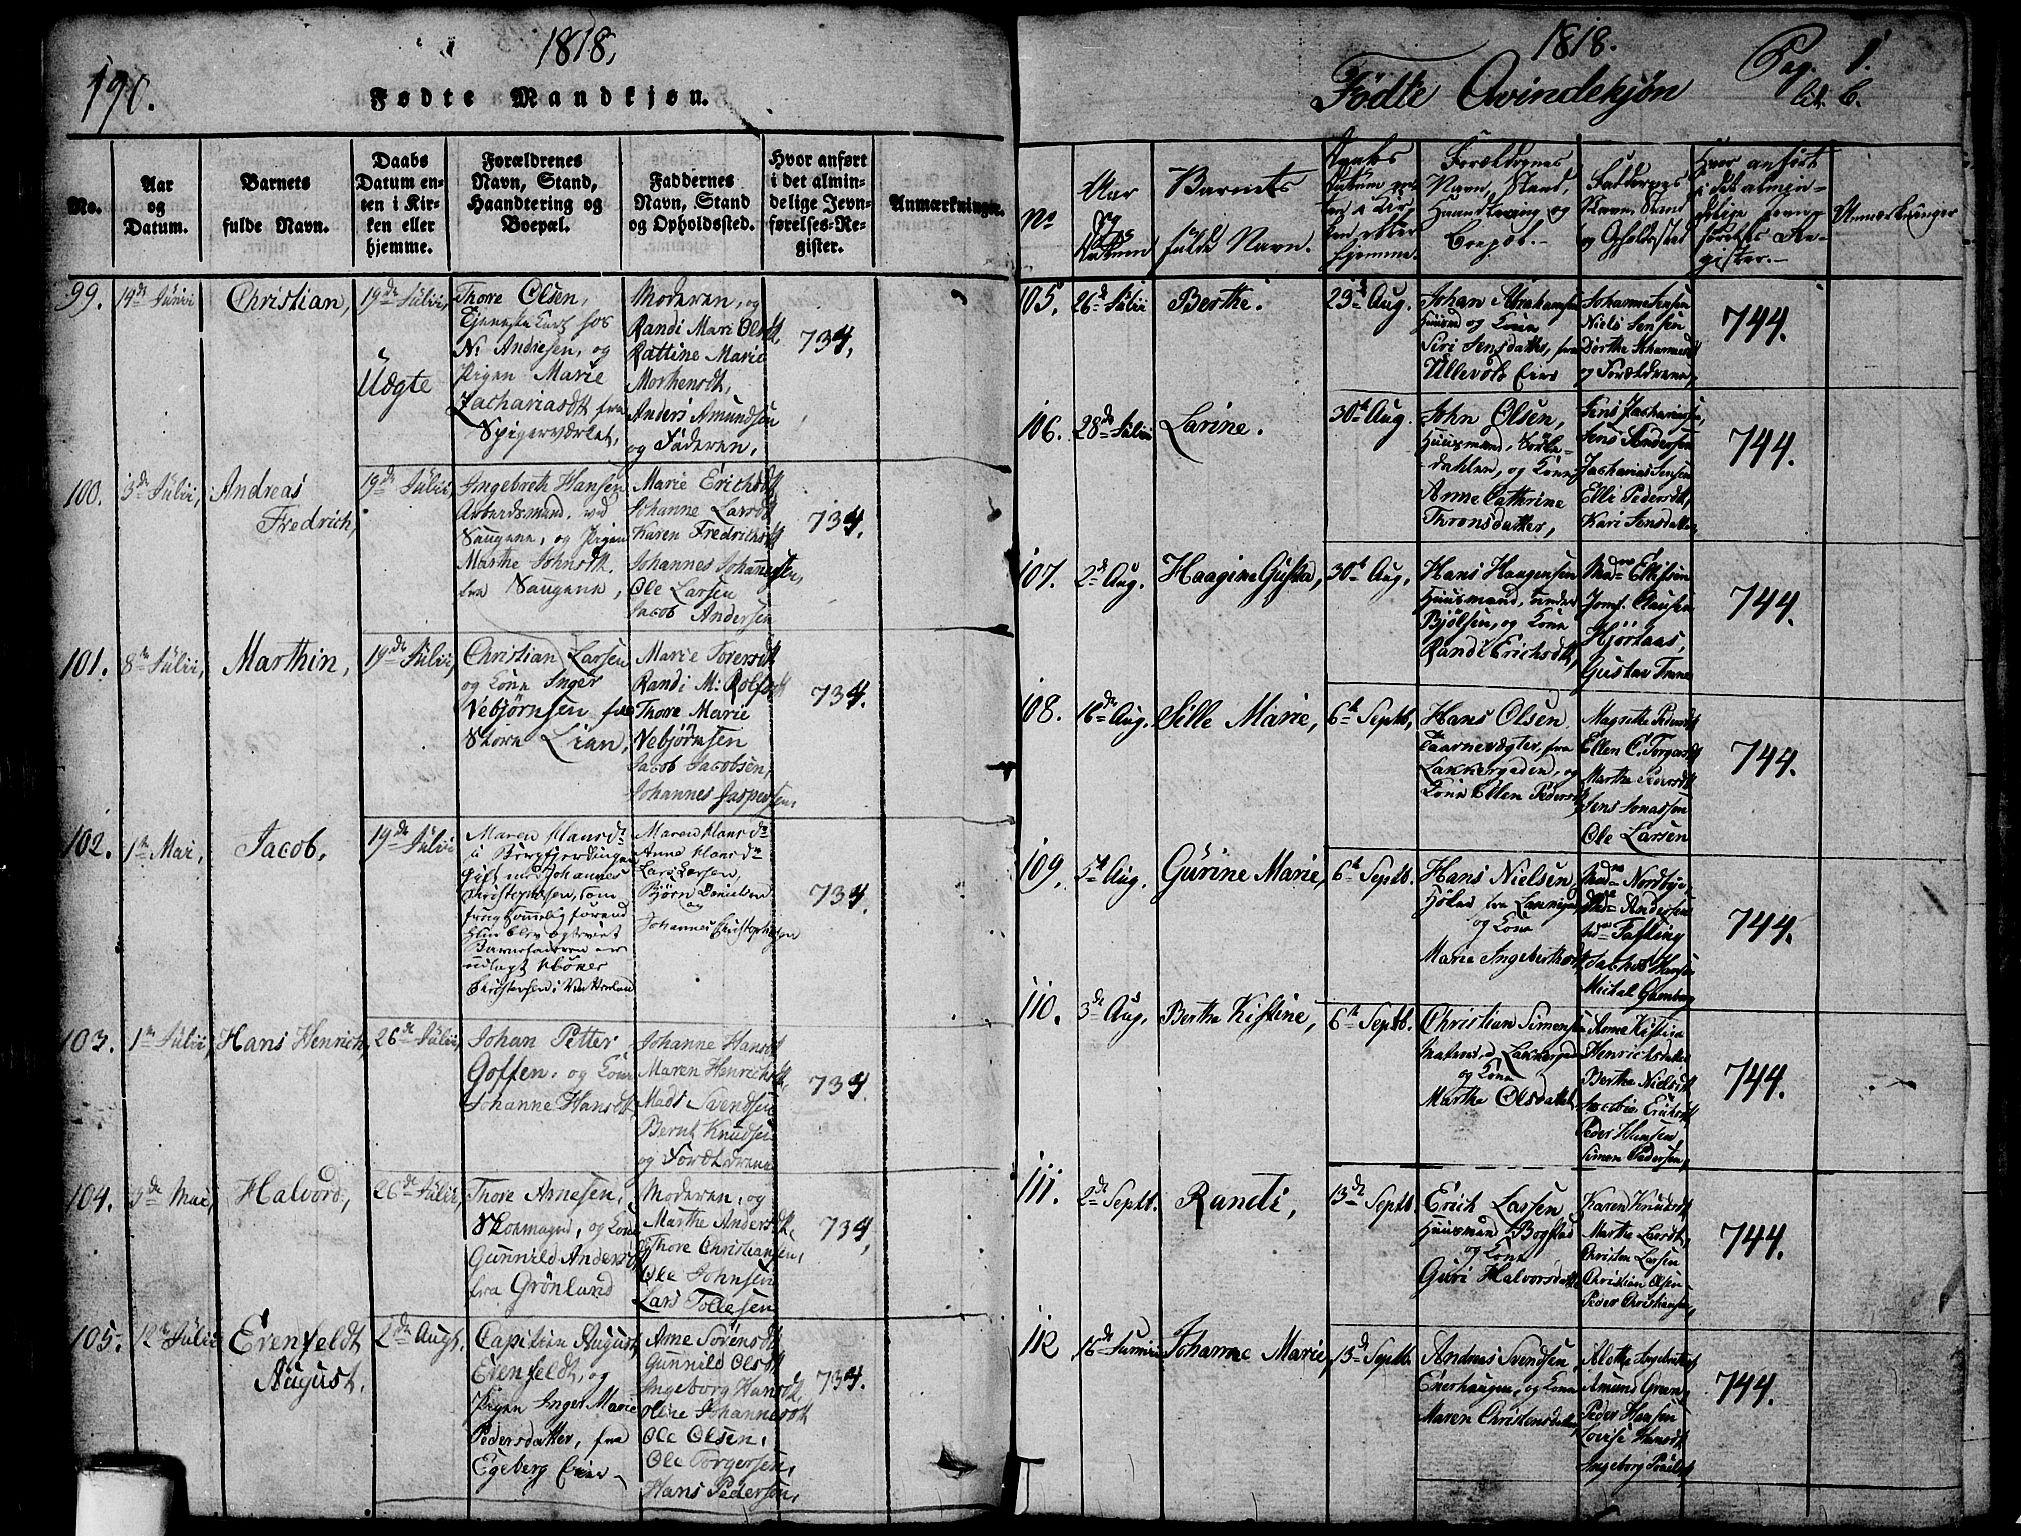 SAO, Aker prestekontor kirkebøker, G/L0002: Parish register (copy) no. 2, 1815-1819, p. 190a-190b